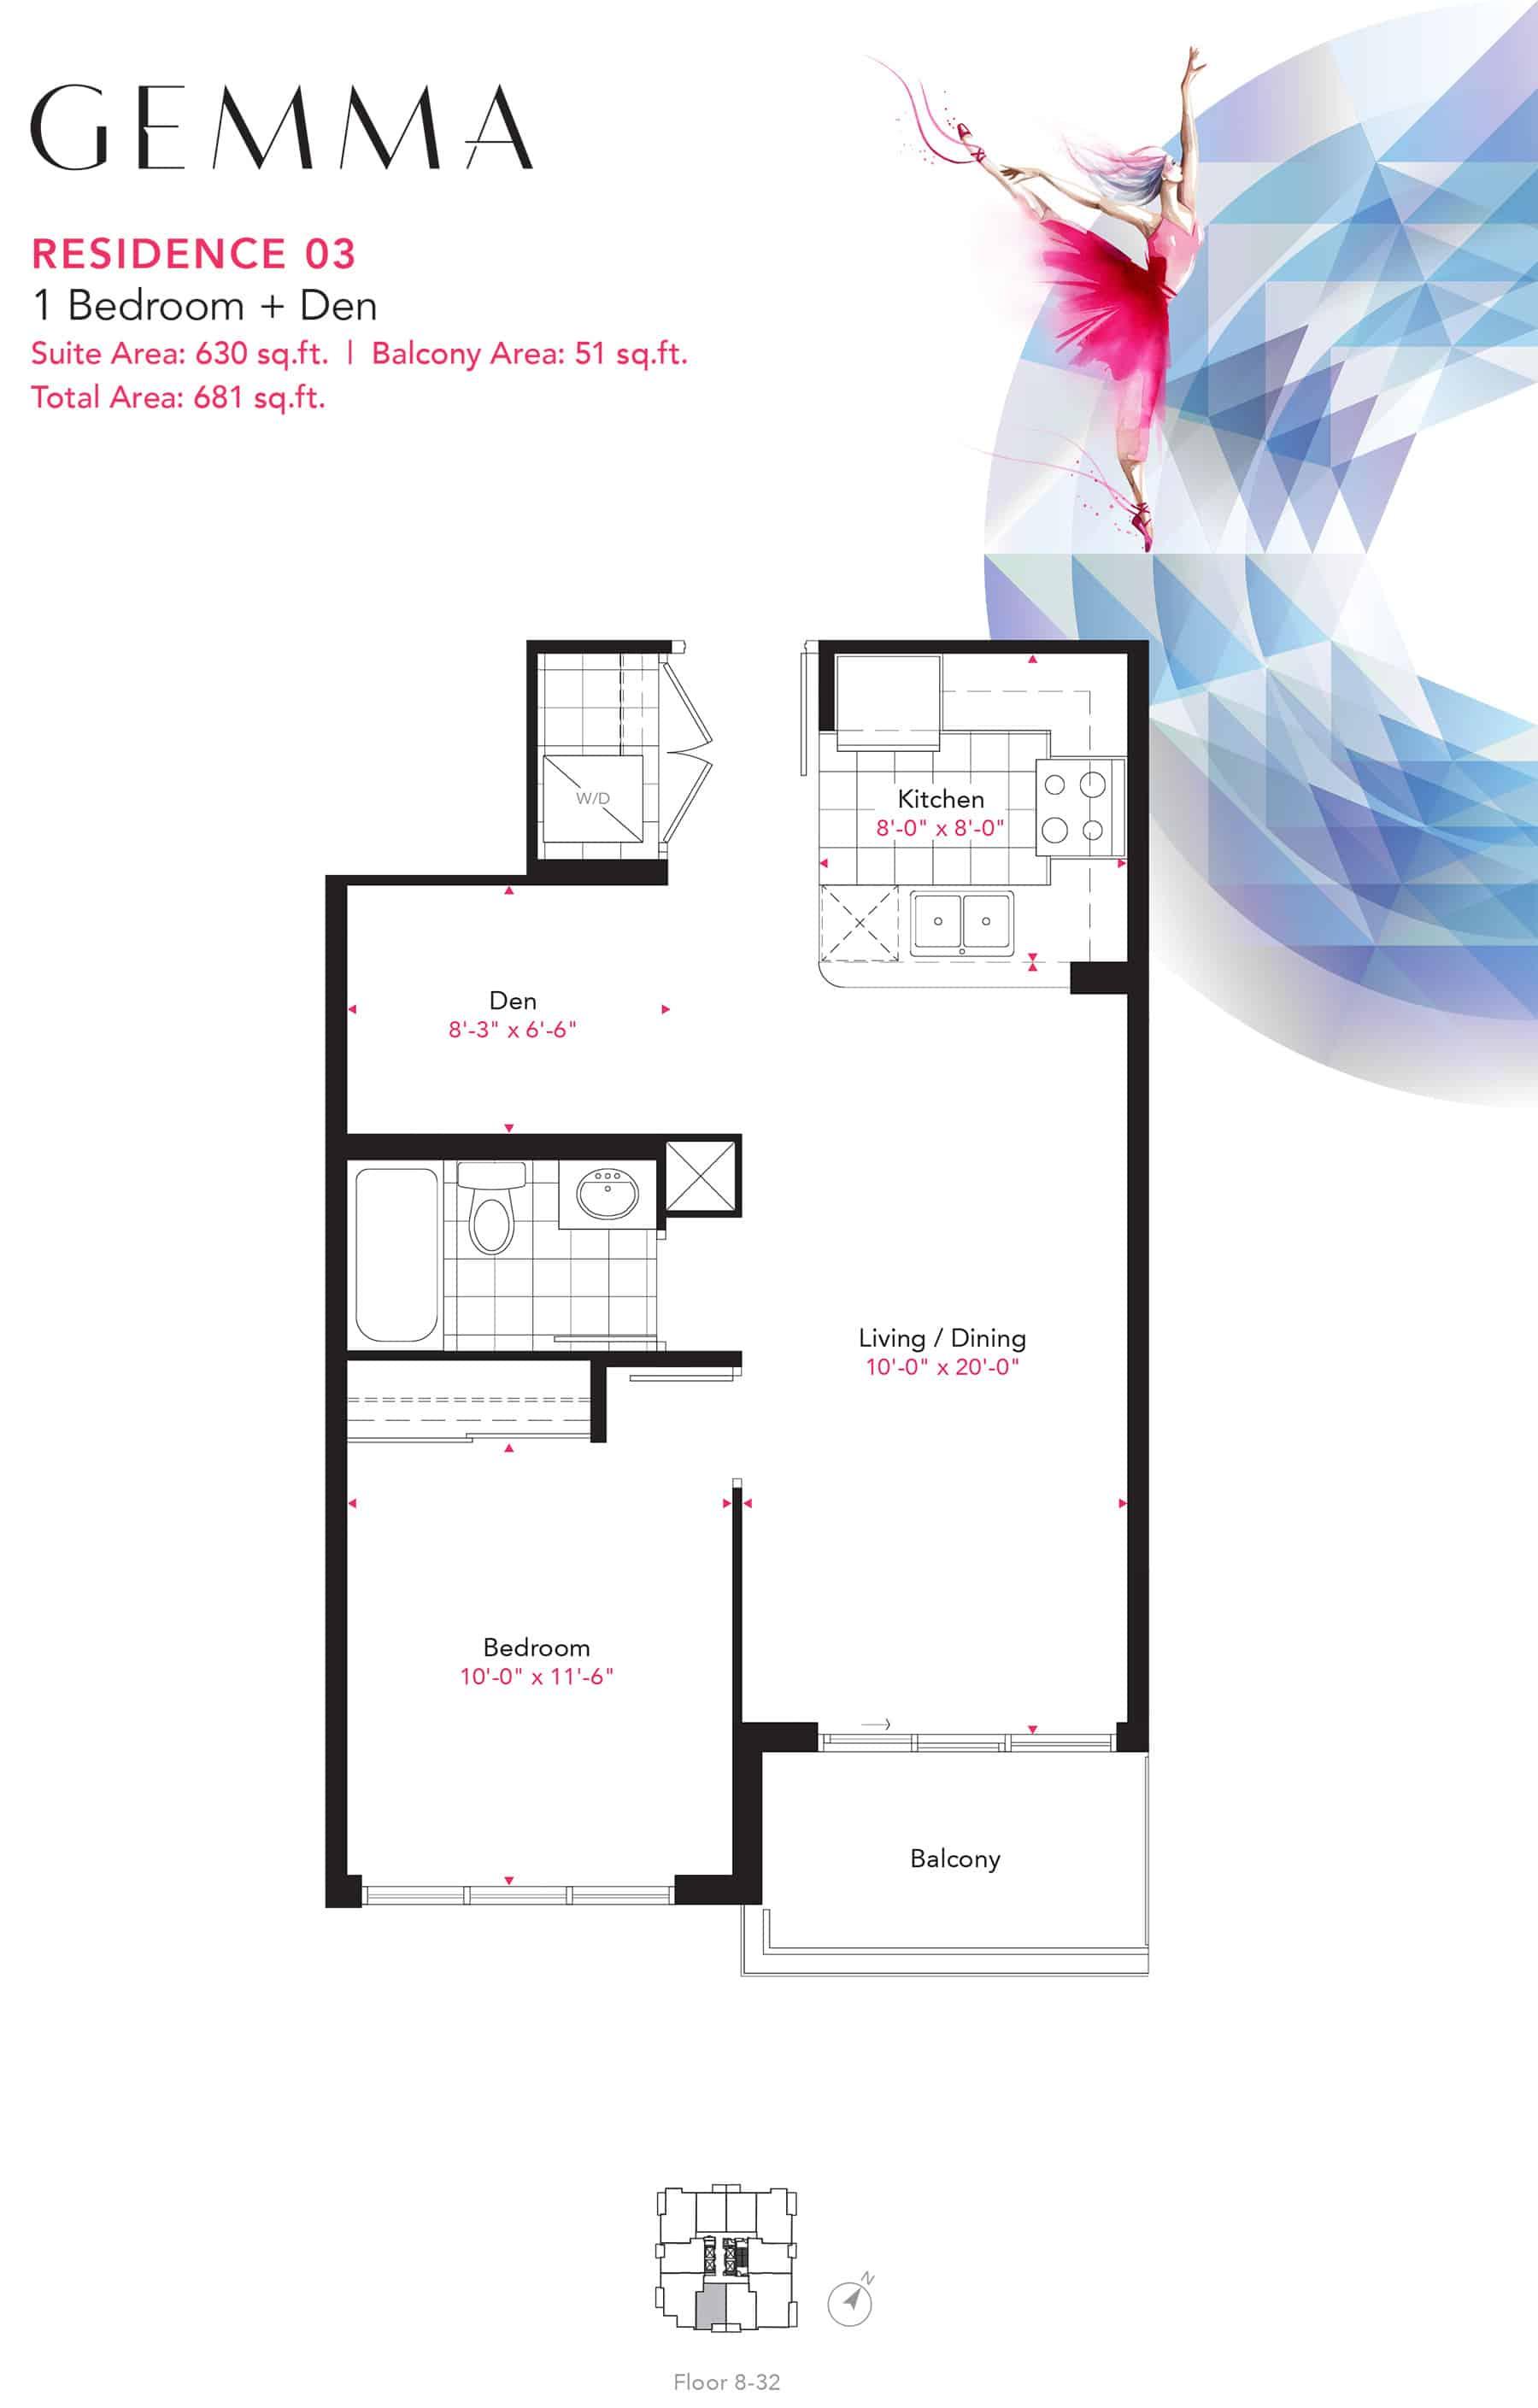 Residence-03-1B+D-630-Sqft-Gemma  Gemma Condos Residence 03 1BD 630 Sqft Gemma